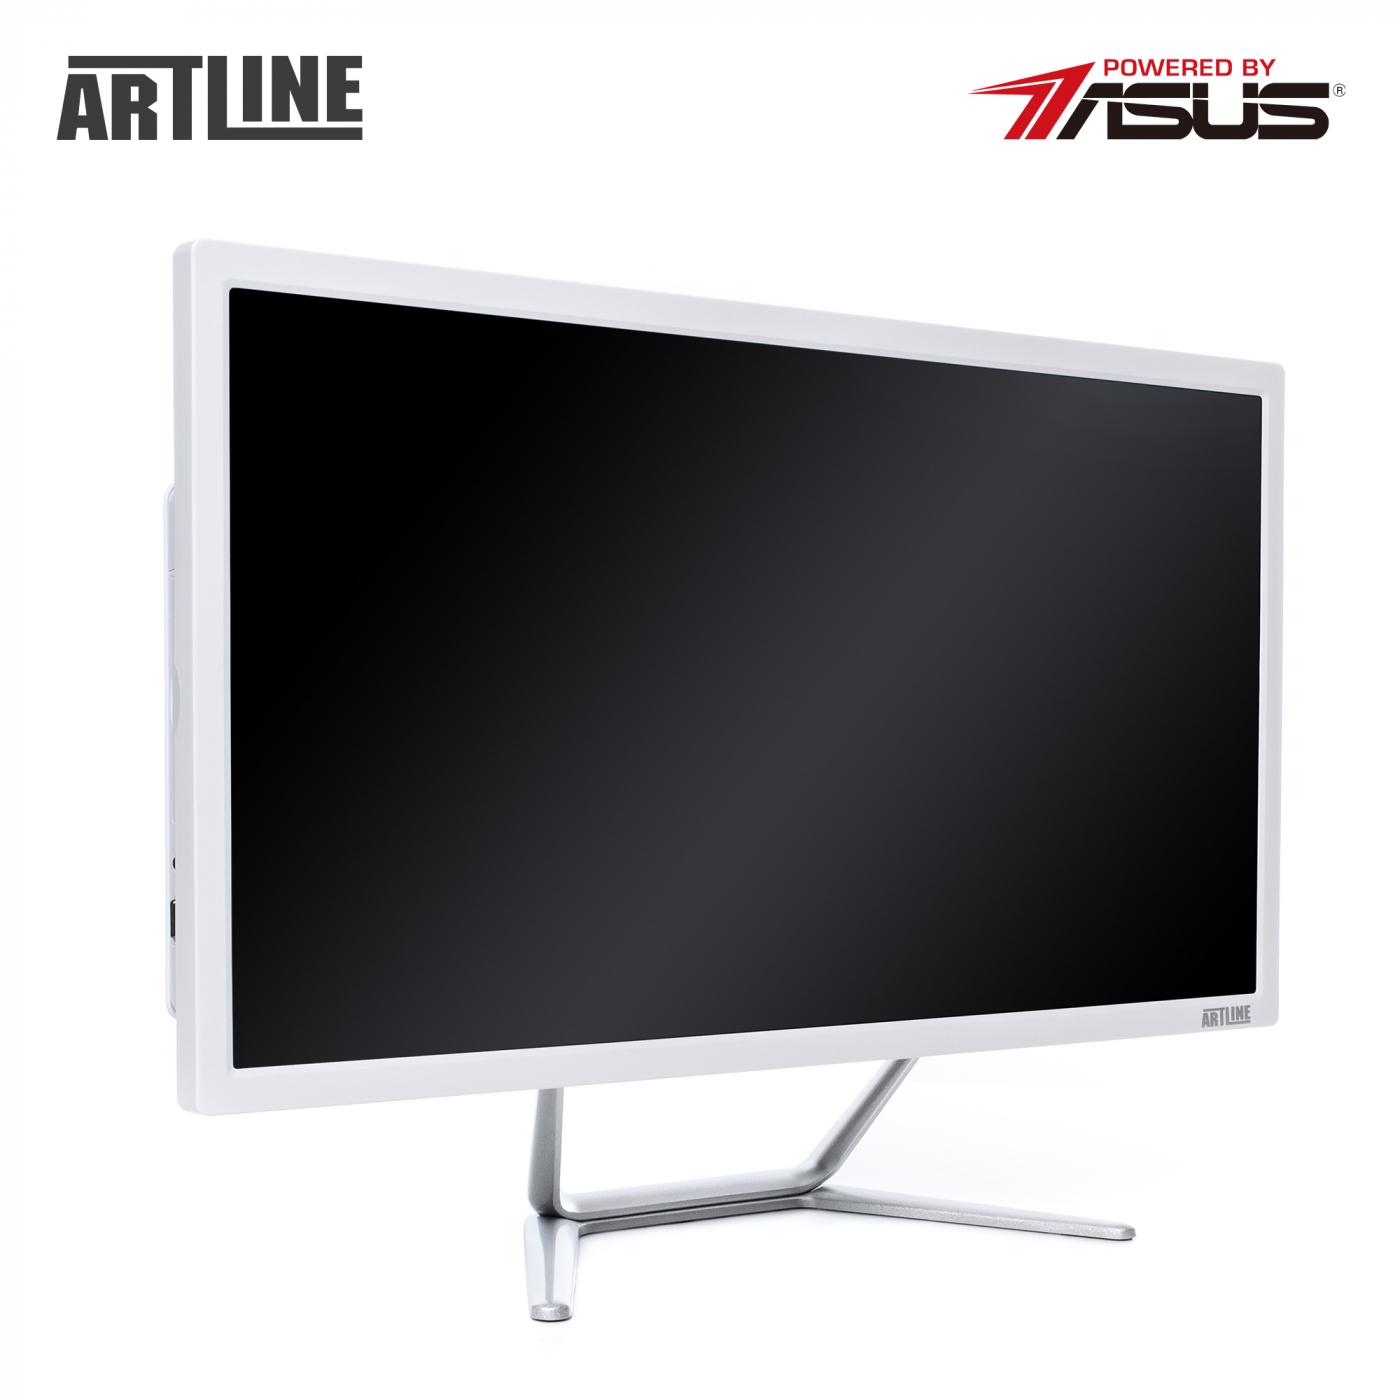 ARTLINE Business F28v02